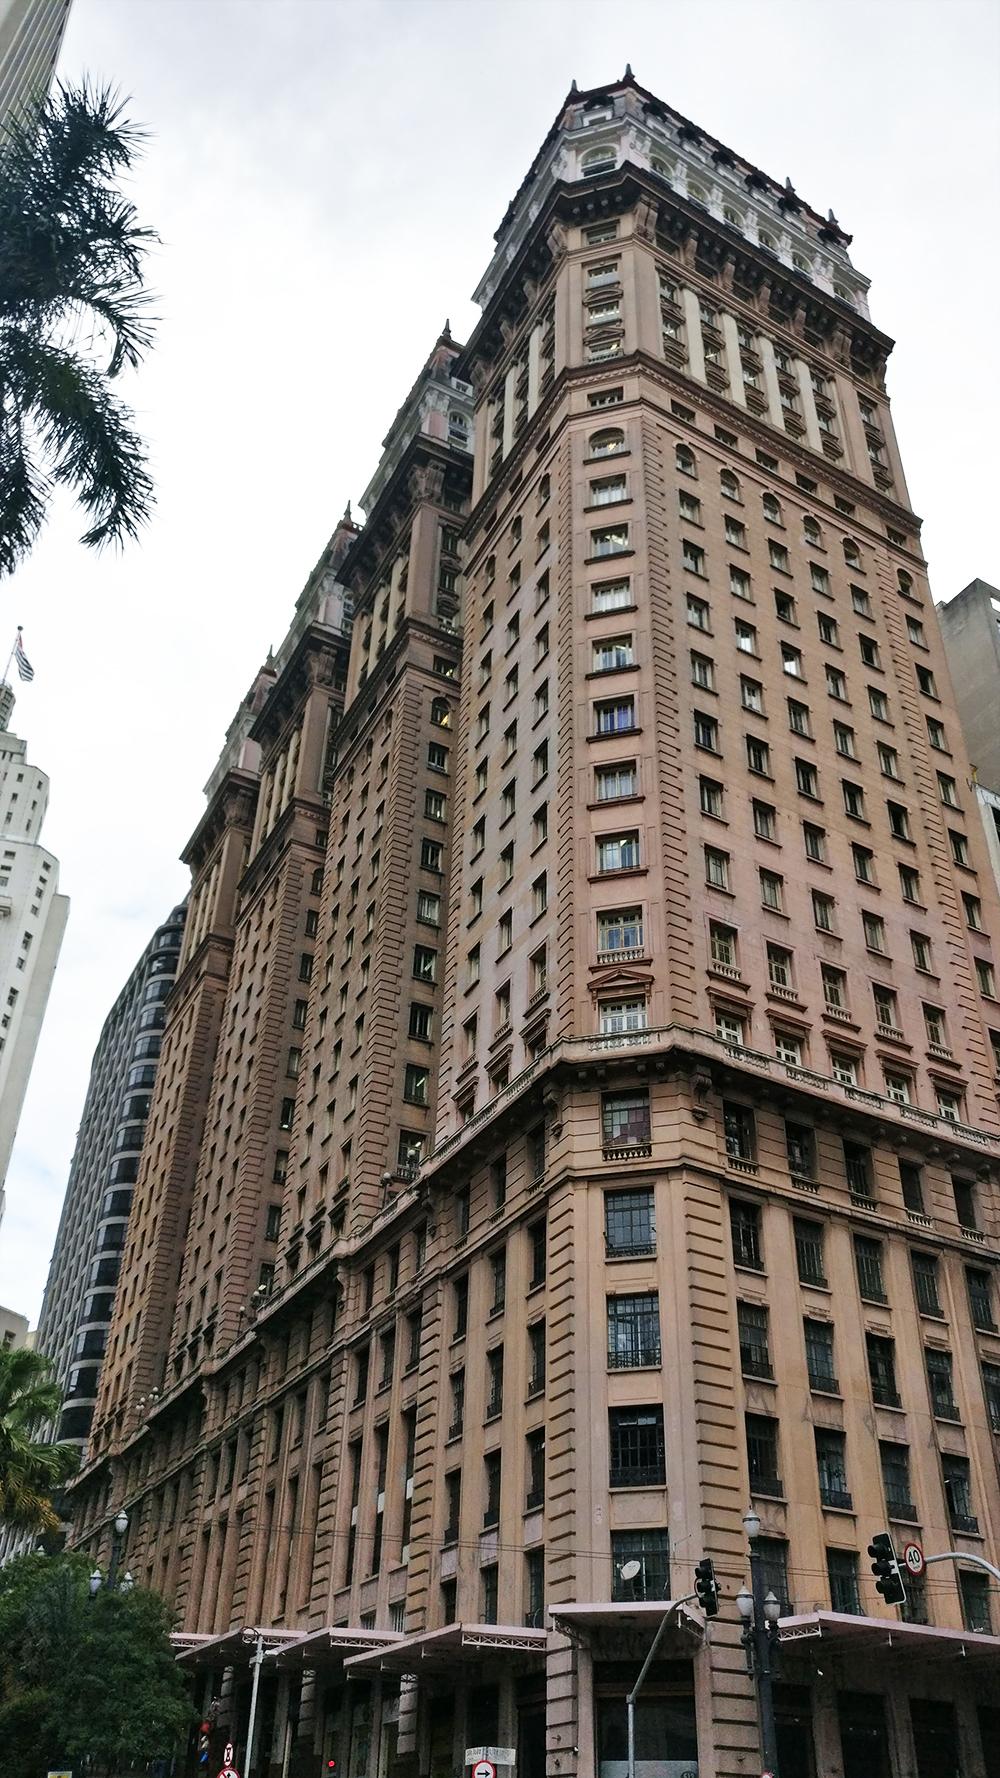 Edifício Martinelli - Historic skyscrapers in São Paulo - 10 things to do and see in São Paulo | Aliz's Wonderland